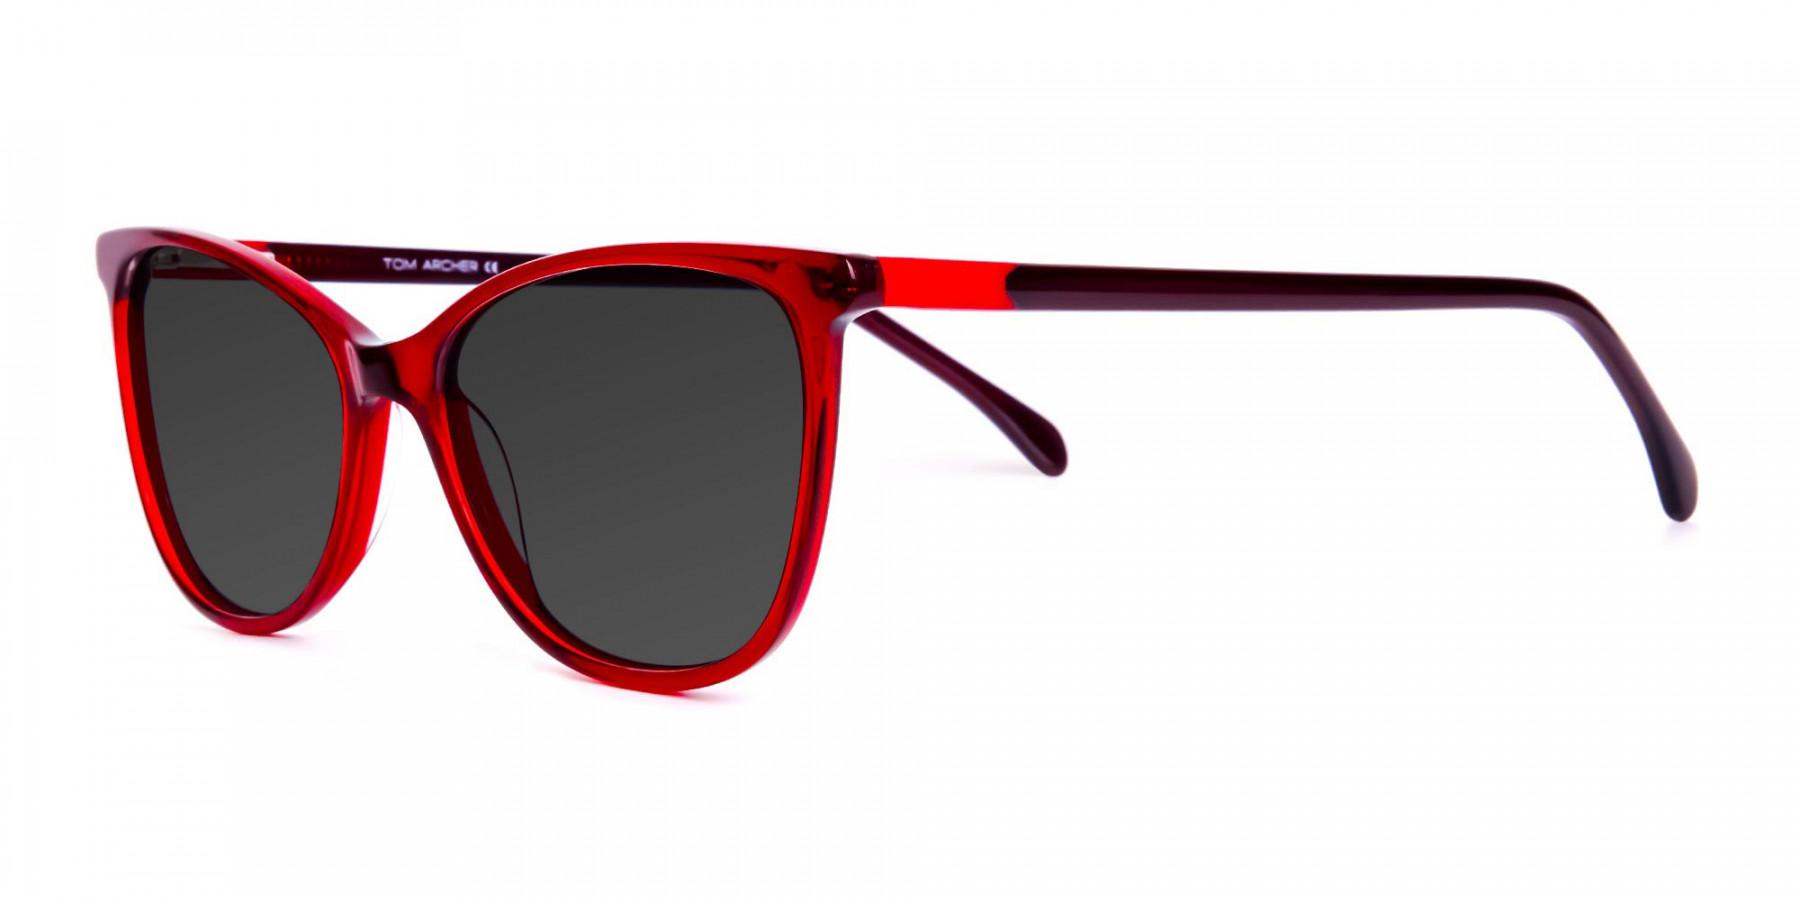 wine-red-translucent-cat-eye-grey-tinted-sunglasses-frames-3